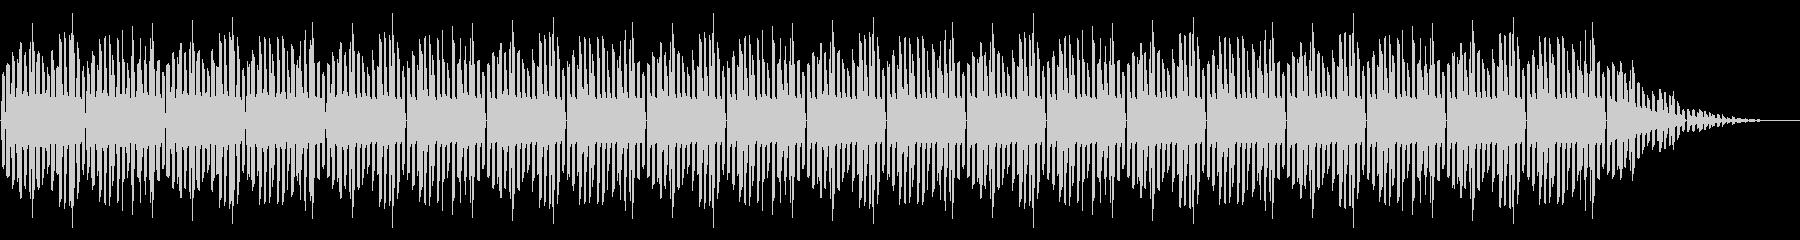 GB風レースゲームのリザルト曲の未再生の波形